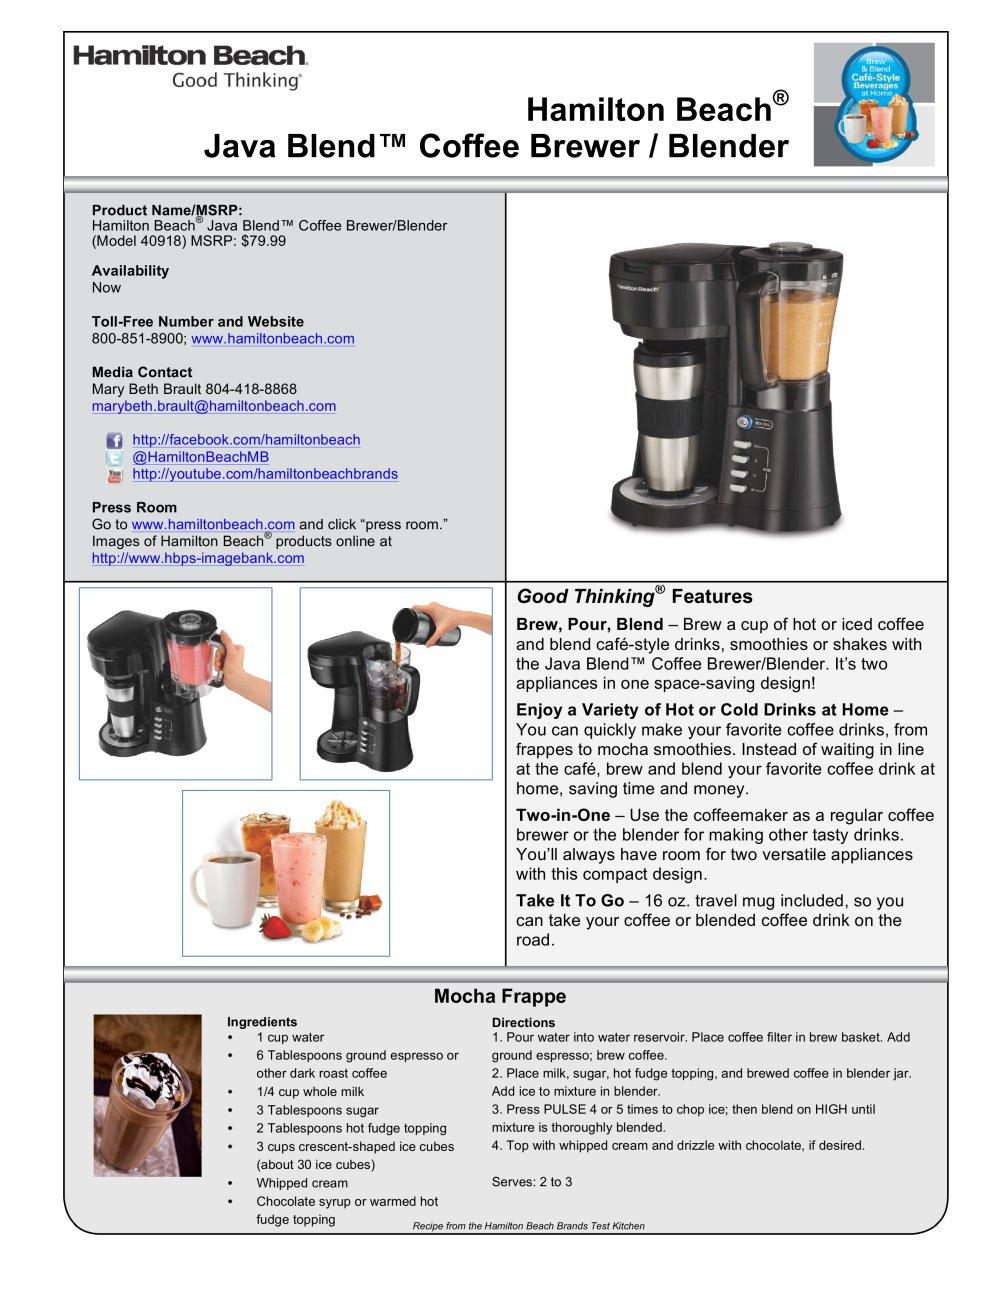 Hamilton Beach Java Blend Coffee Brewer Blender 40918